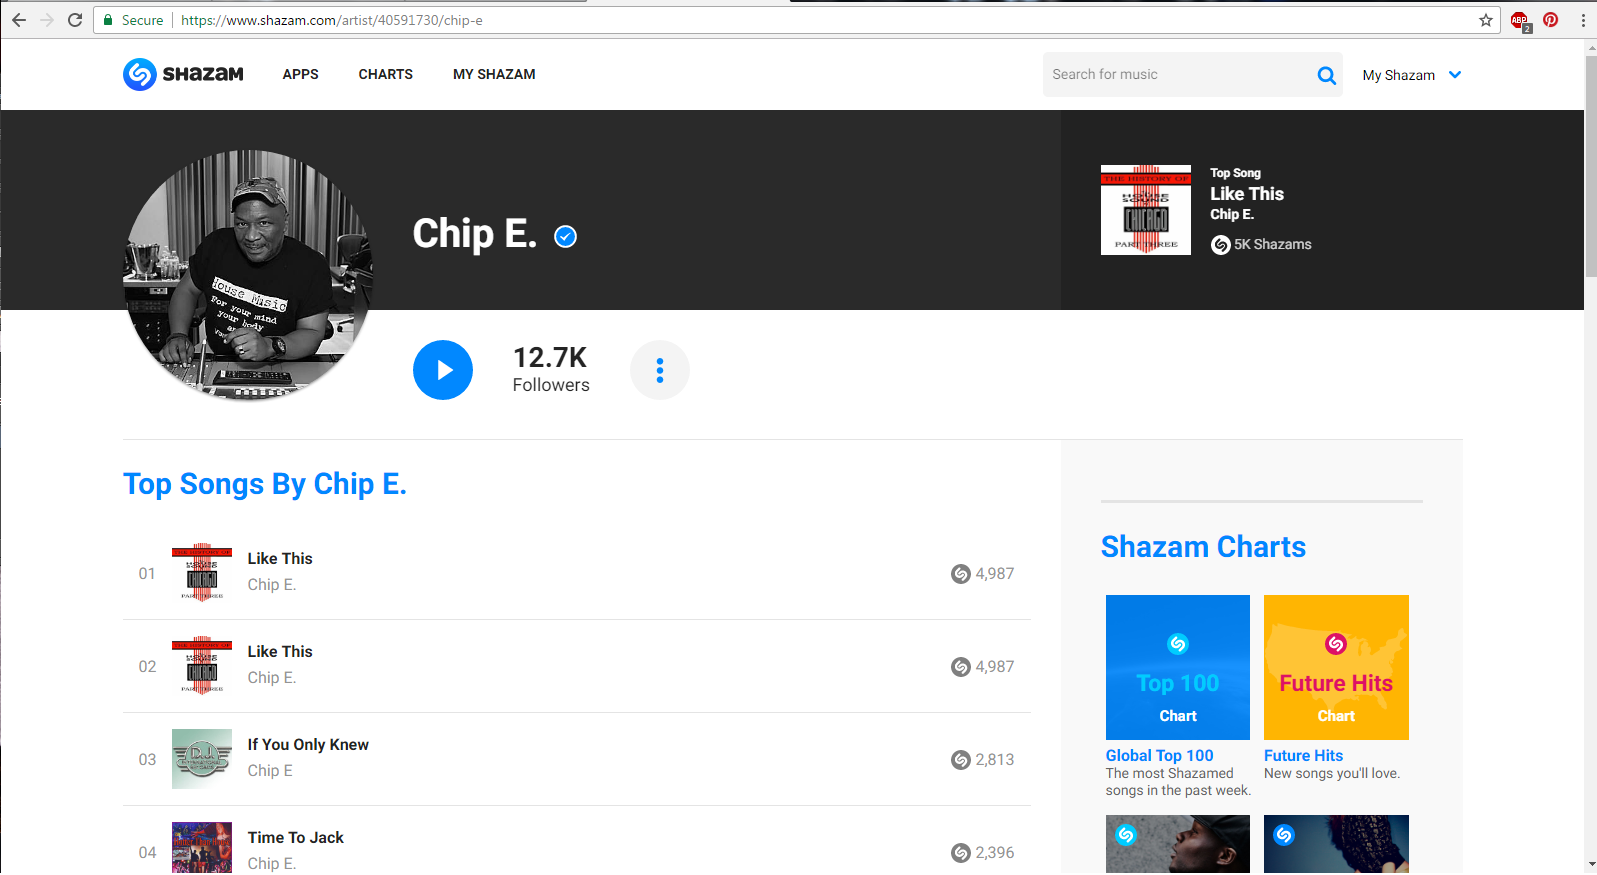 Chip E is Verified on Shazam